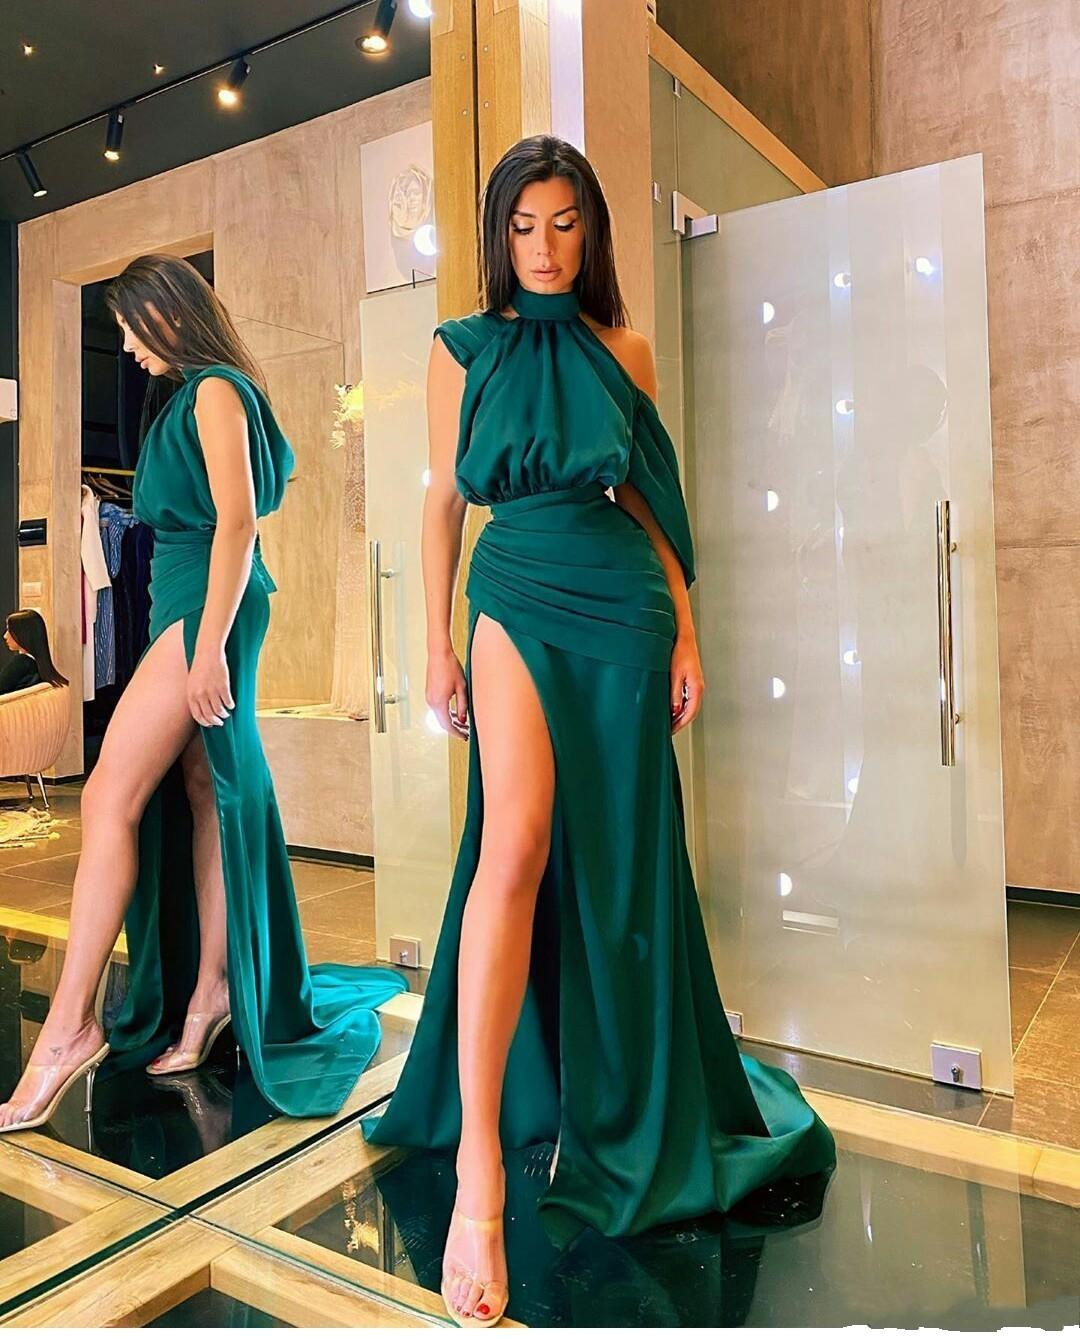 2021 Vintage Sexy Dark Green Arabia Prom Dresses High Neck Dubai Mermaid Side Split Evening Dress Satin Formal Party Gowns Custom Made Sweep Train Plus Size